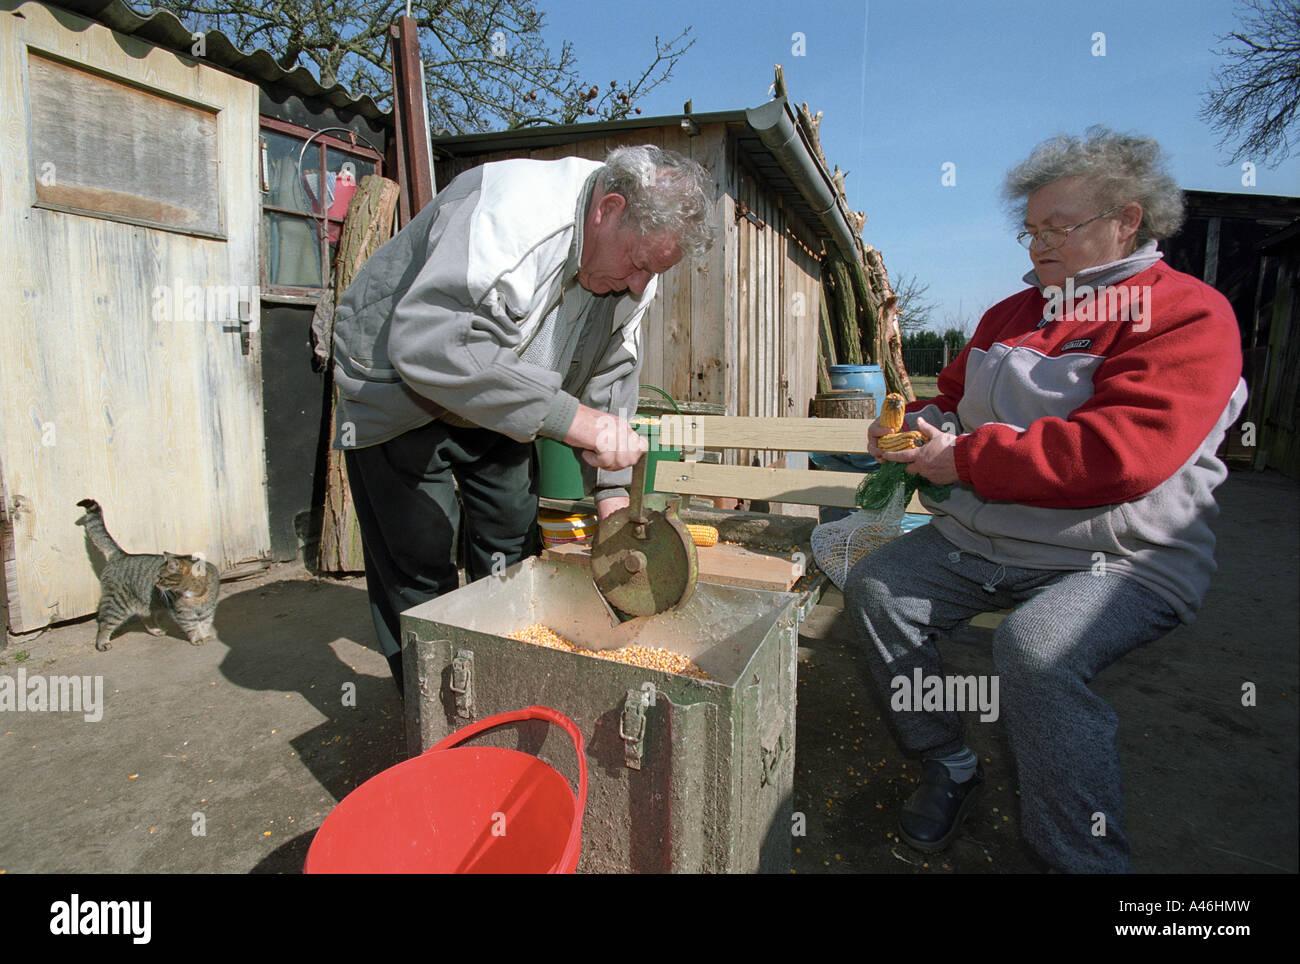 Elderly countryside dwellers - Stock Image